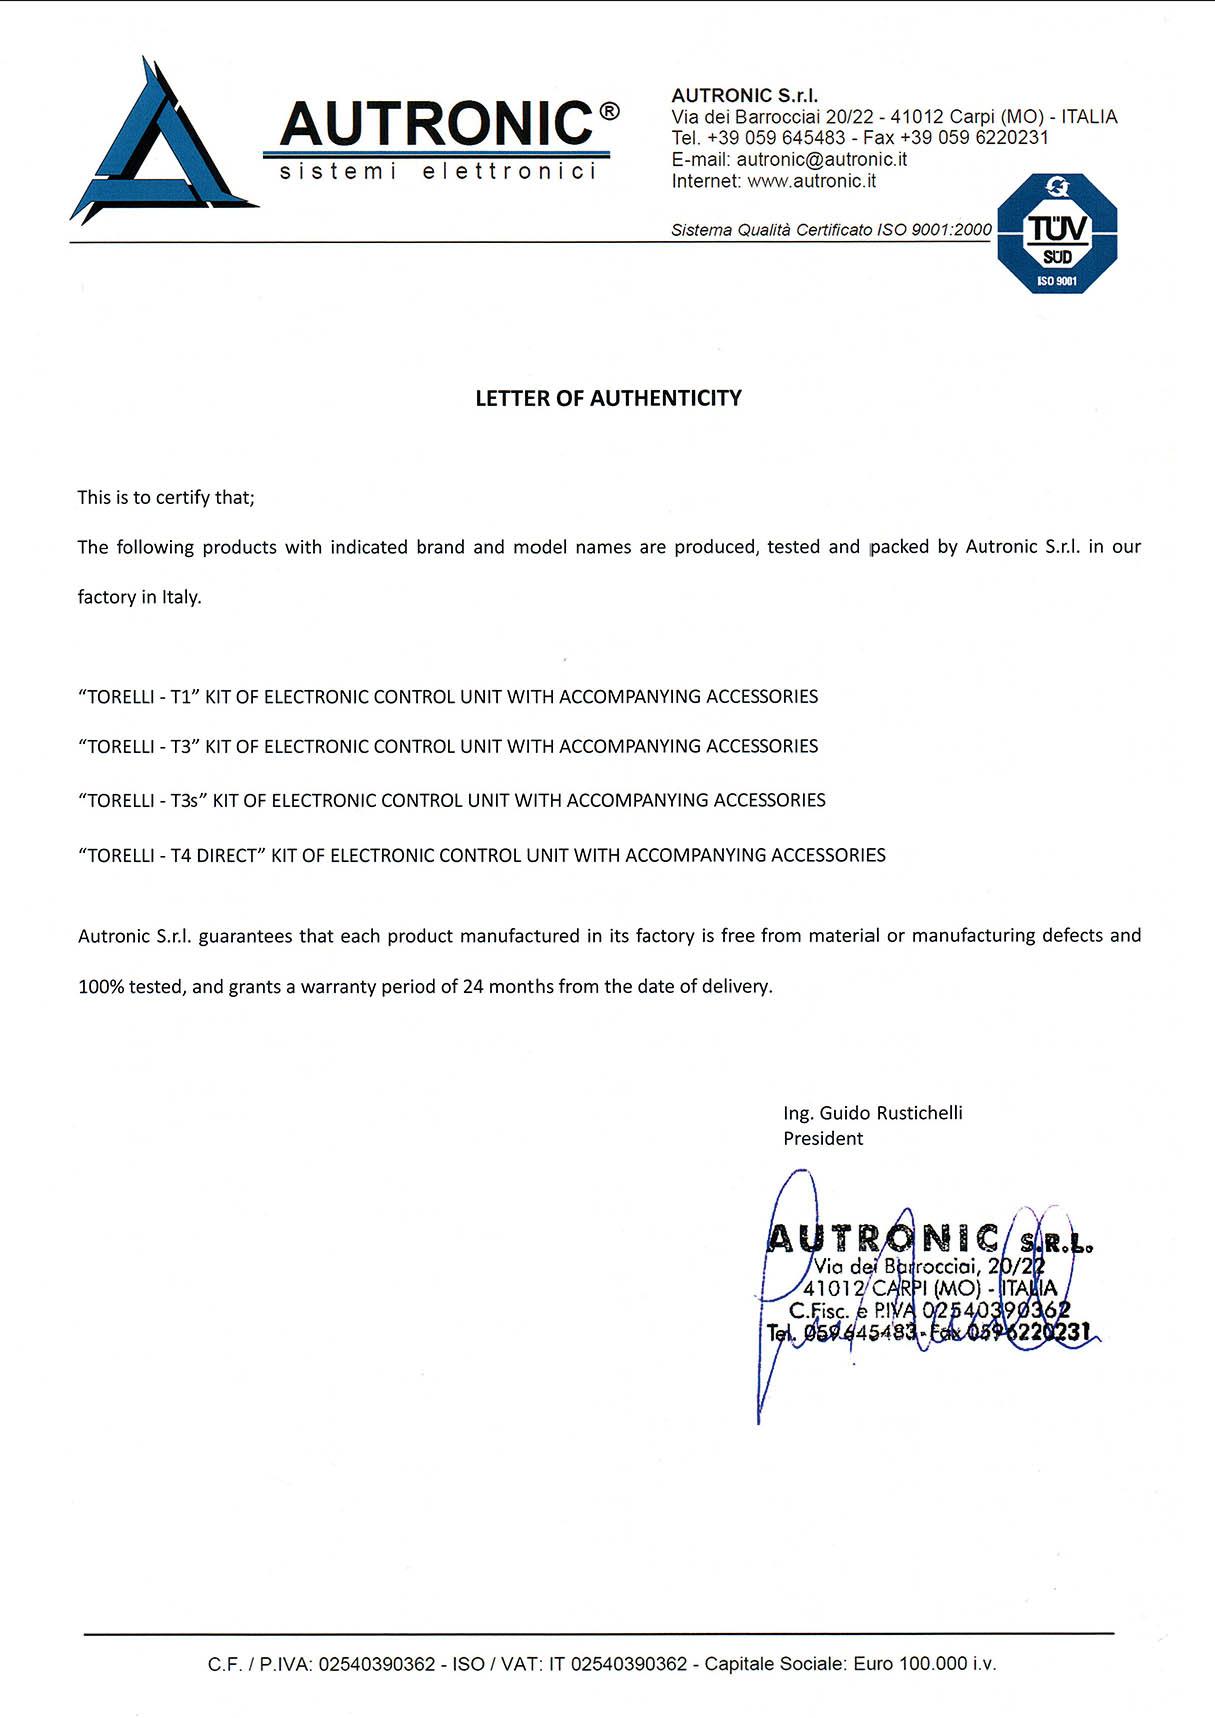 Мини-комплект ГБО 4 поколения Torelli T3 Pro OBD (редуктор Torelli Taurus, форсунки Torelli, фильтр, датчик уровня топлива AEB1090)